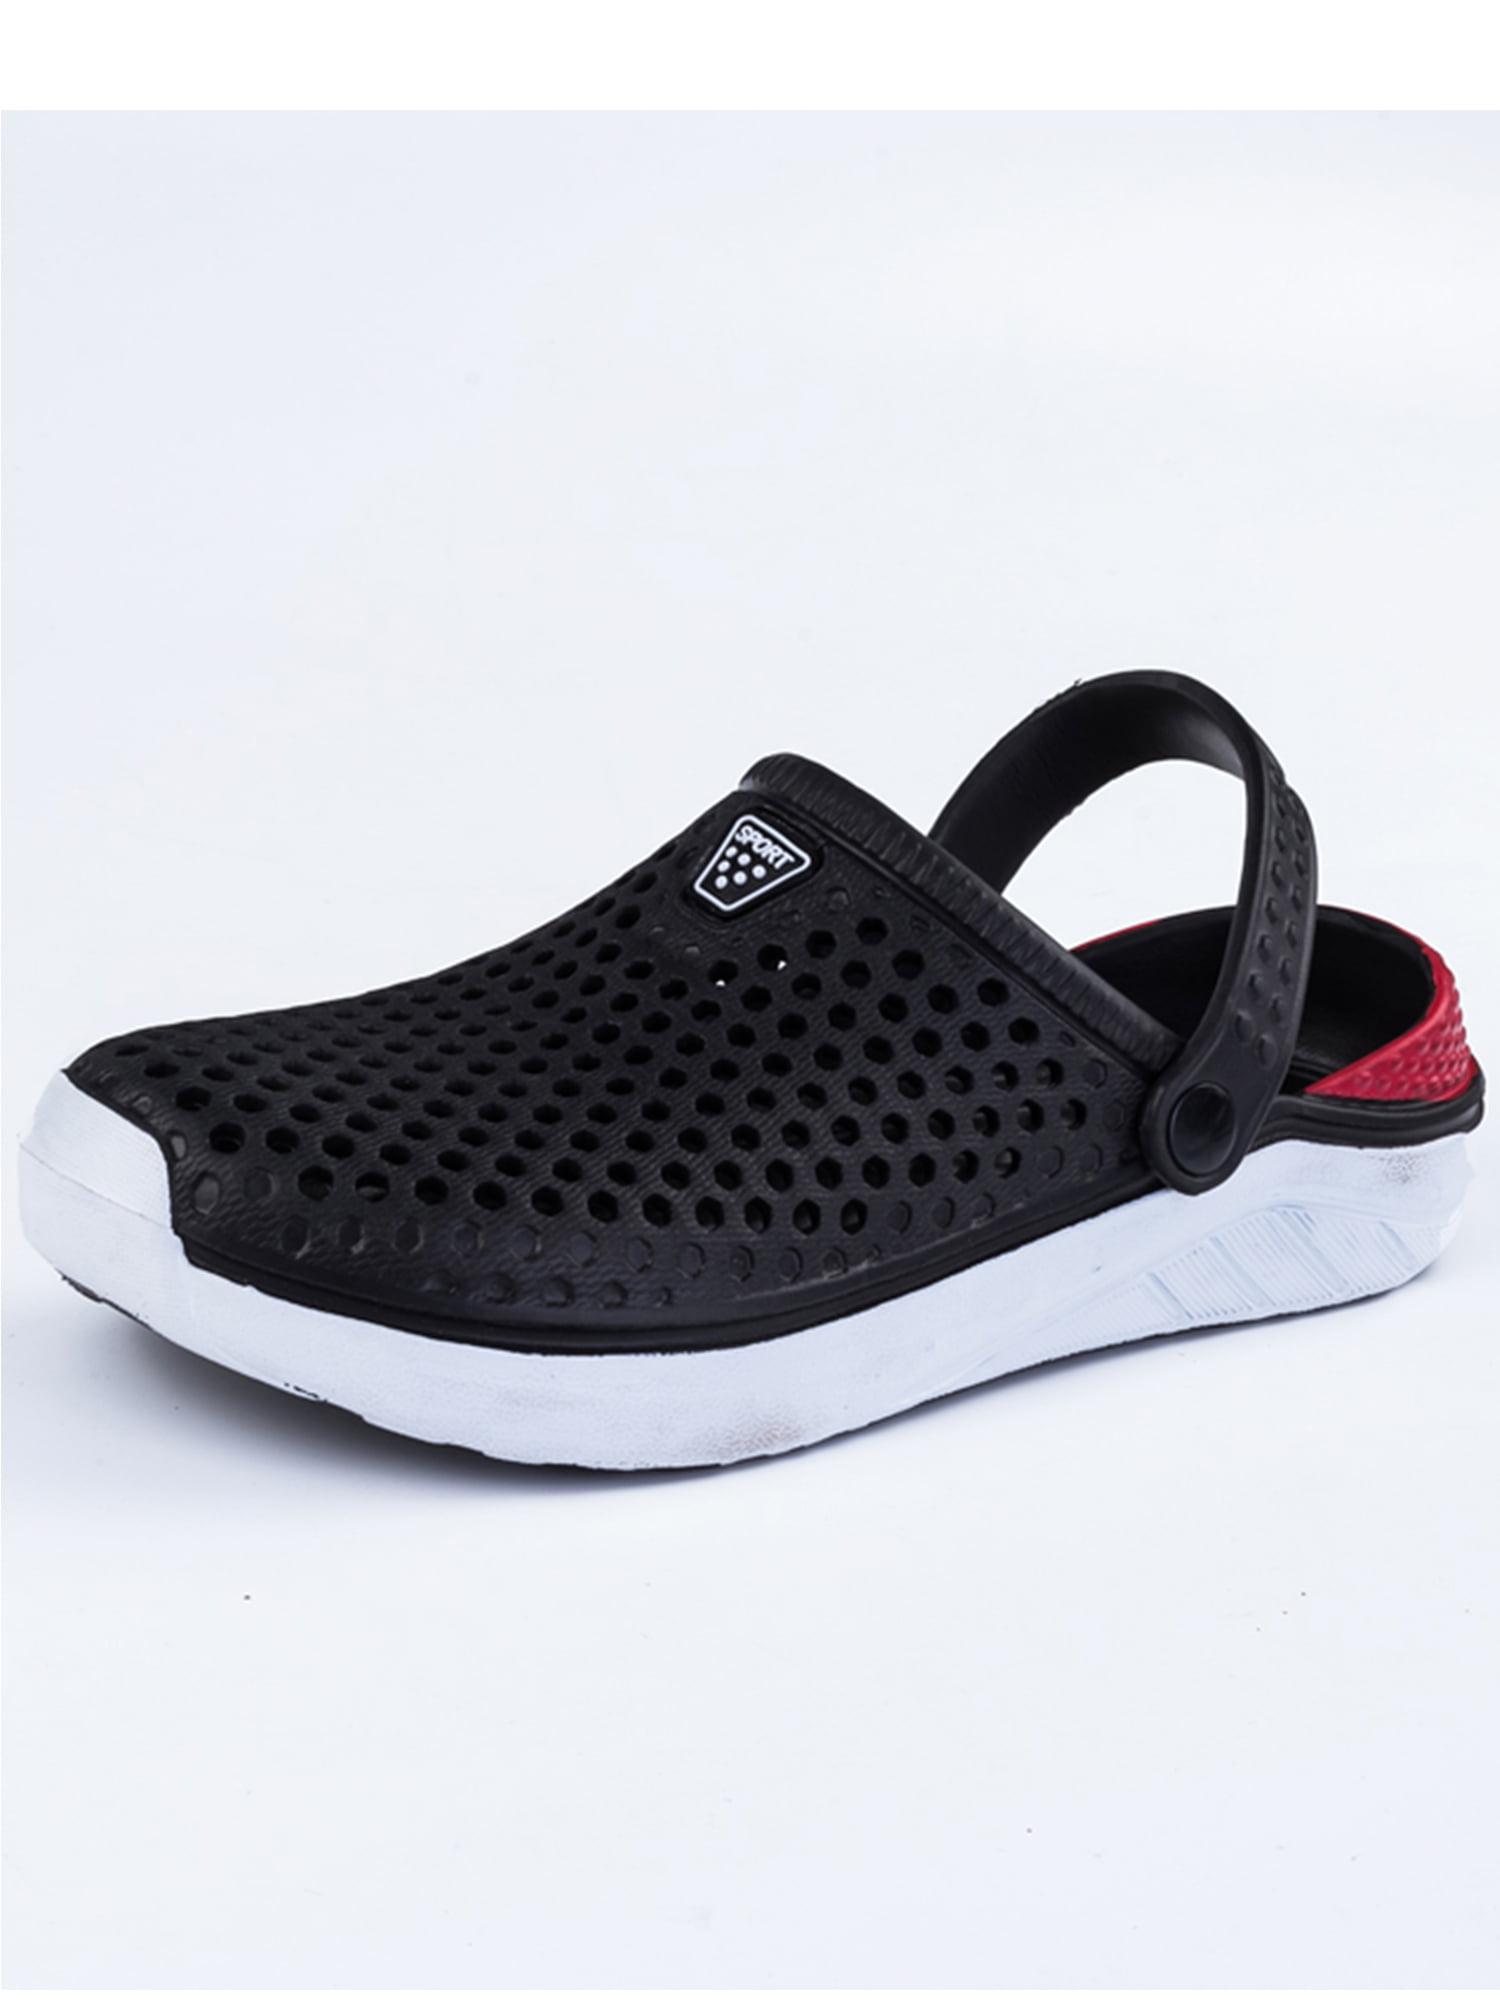 Non-Slip Boys Slide Lightweight Cartoon Slip-on Shoes Beach Pool Shower Slippers HAALIFE◕‿to Summer Garden Clogs Sandals